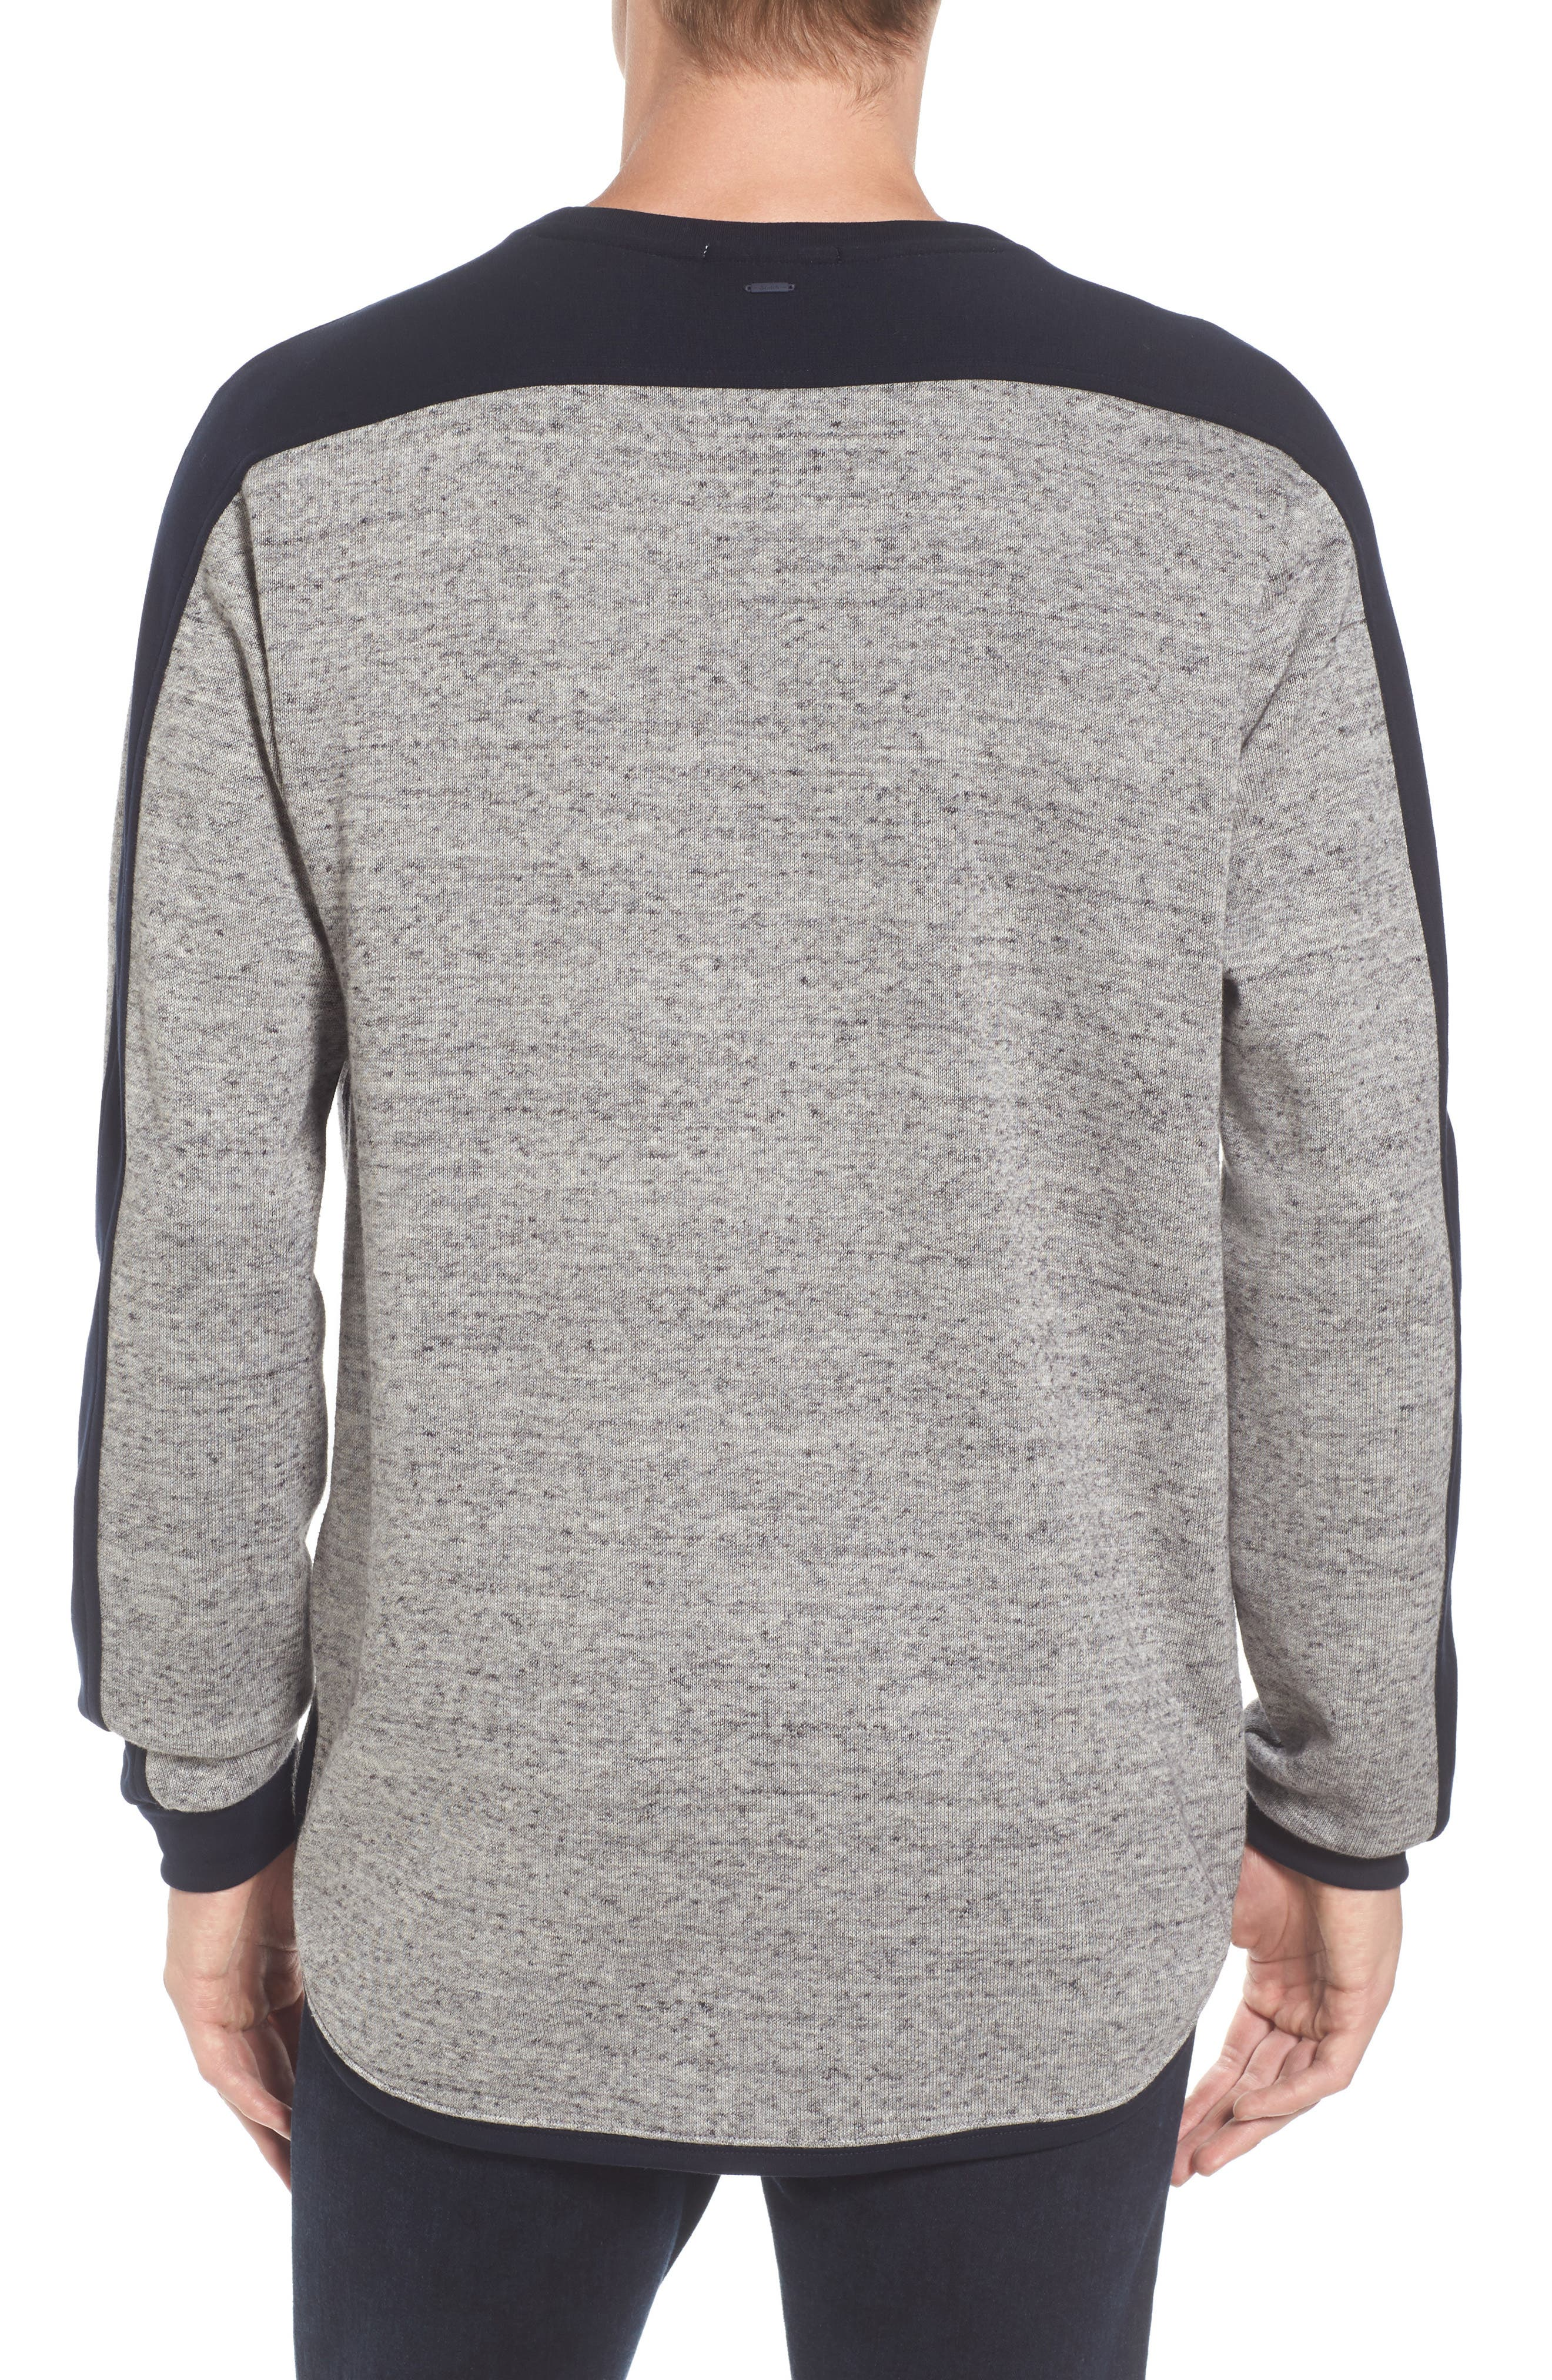 Panel Sweatshirt,                             Alternate thumbnail 2, color,                             Grey